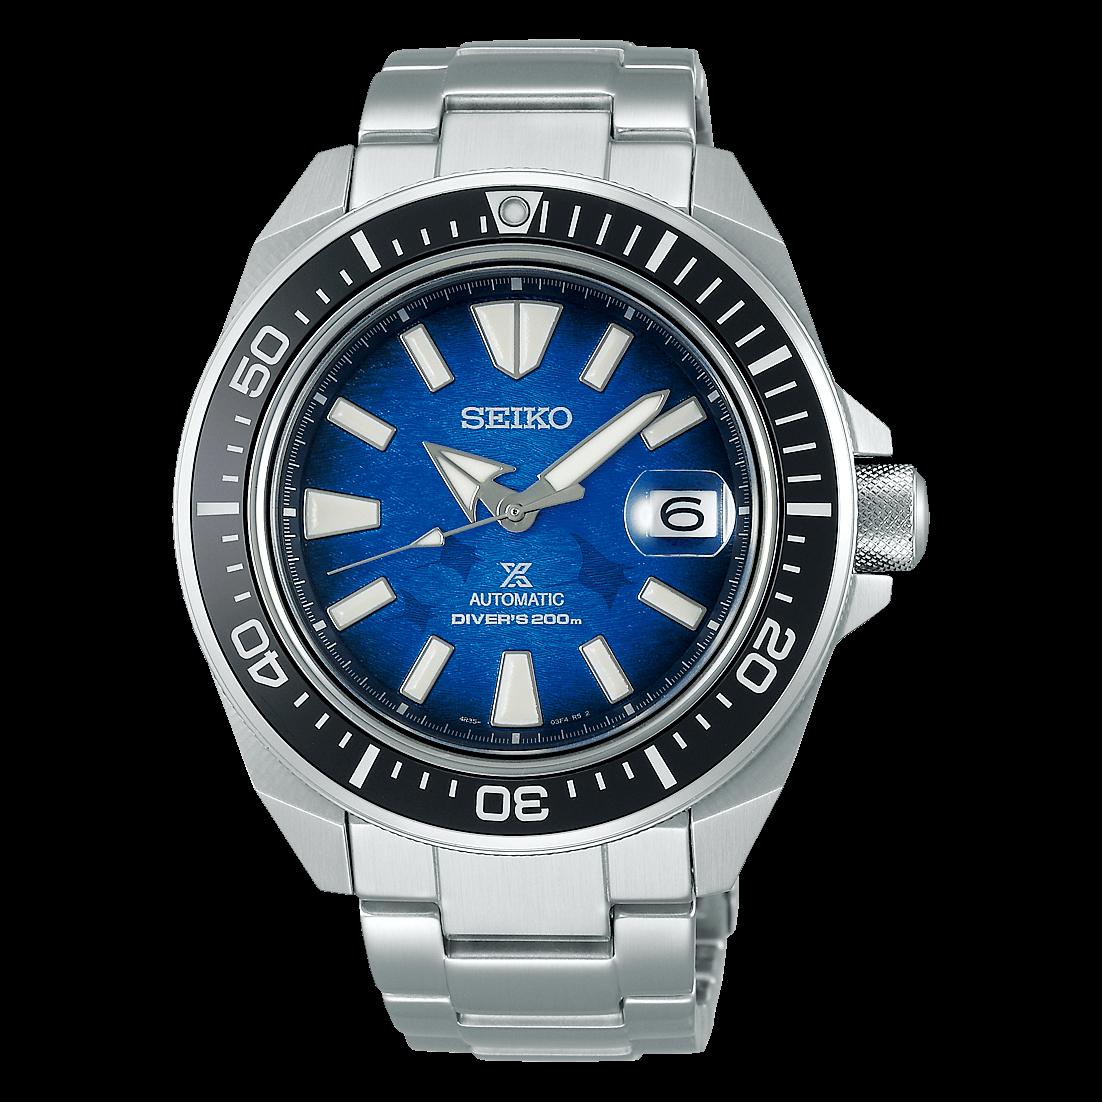 Seiko Prospex SRPE33P1 King Samurai Save the Ocean